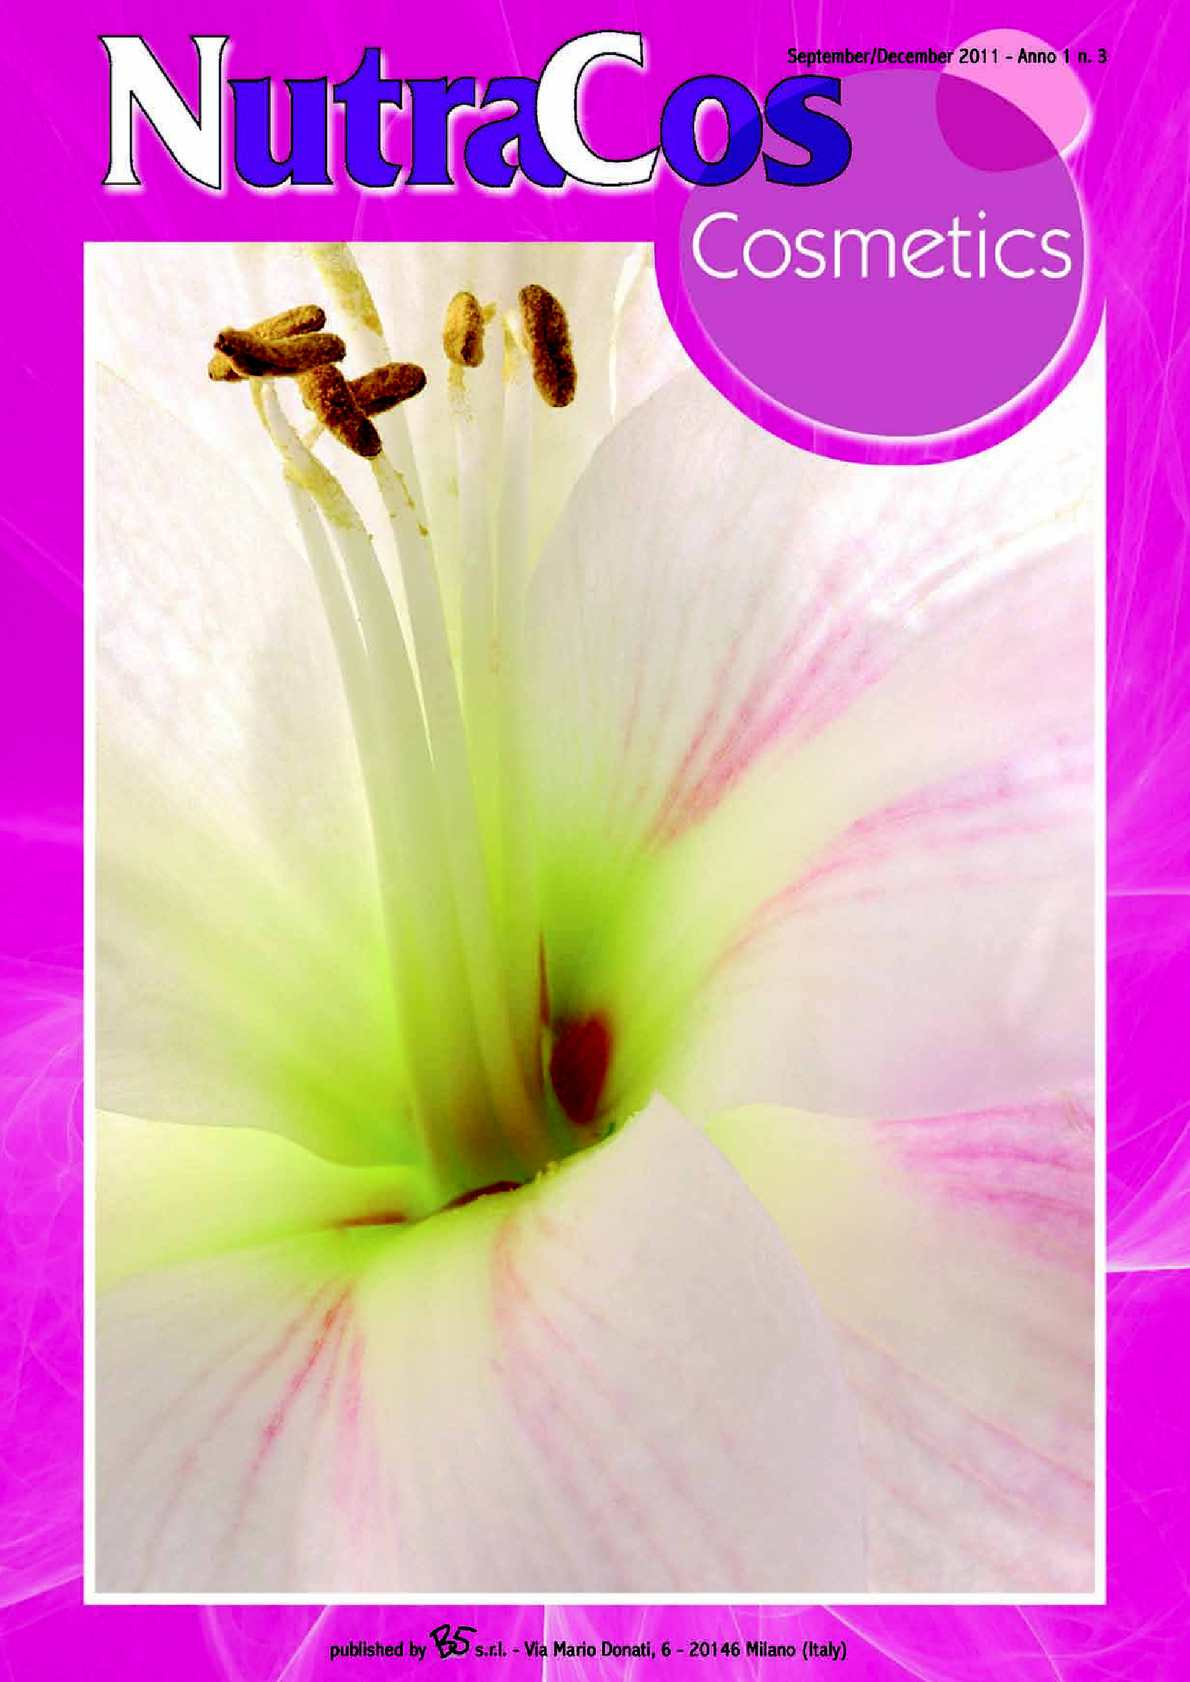 Calamo Nutracos Cosmetics September December 2011 Curcuma Rmulsion Blackcurrant Flavour